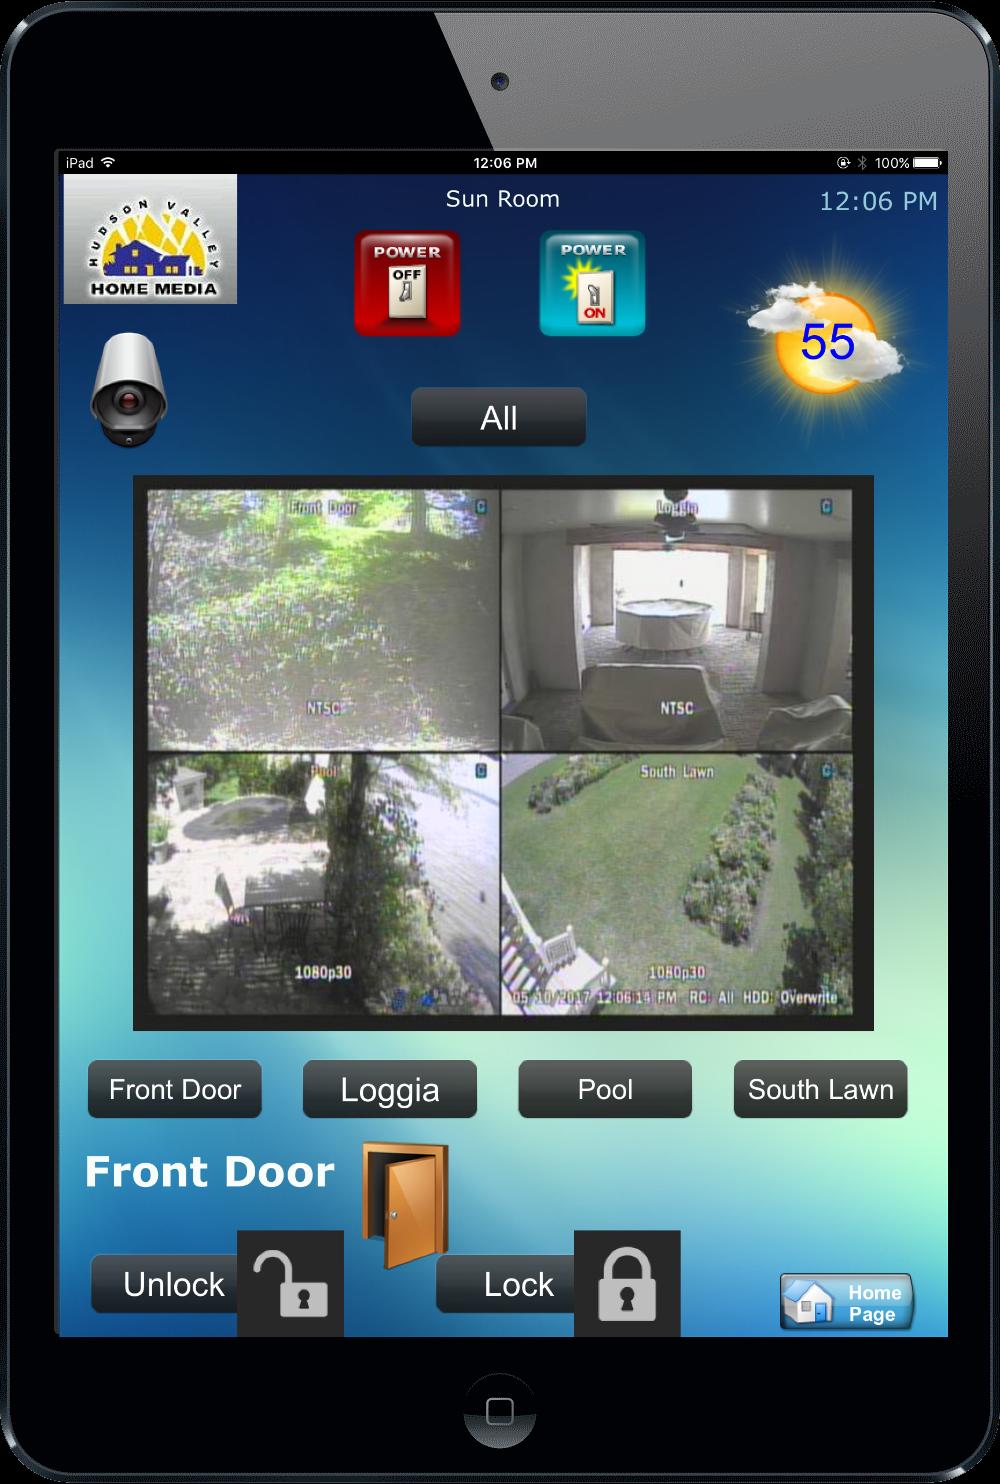 Universal Ipad Remote - Nyack, NY - HV Home Media - Hudson Valley Home Media - Watch Security Cameras - CCTV